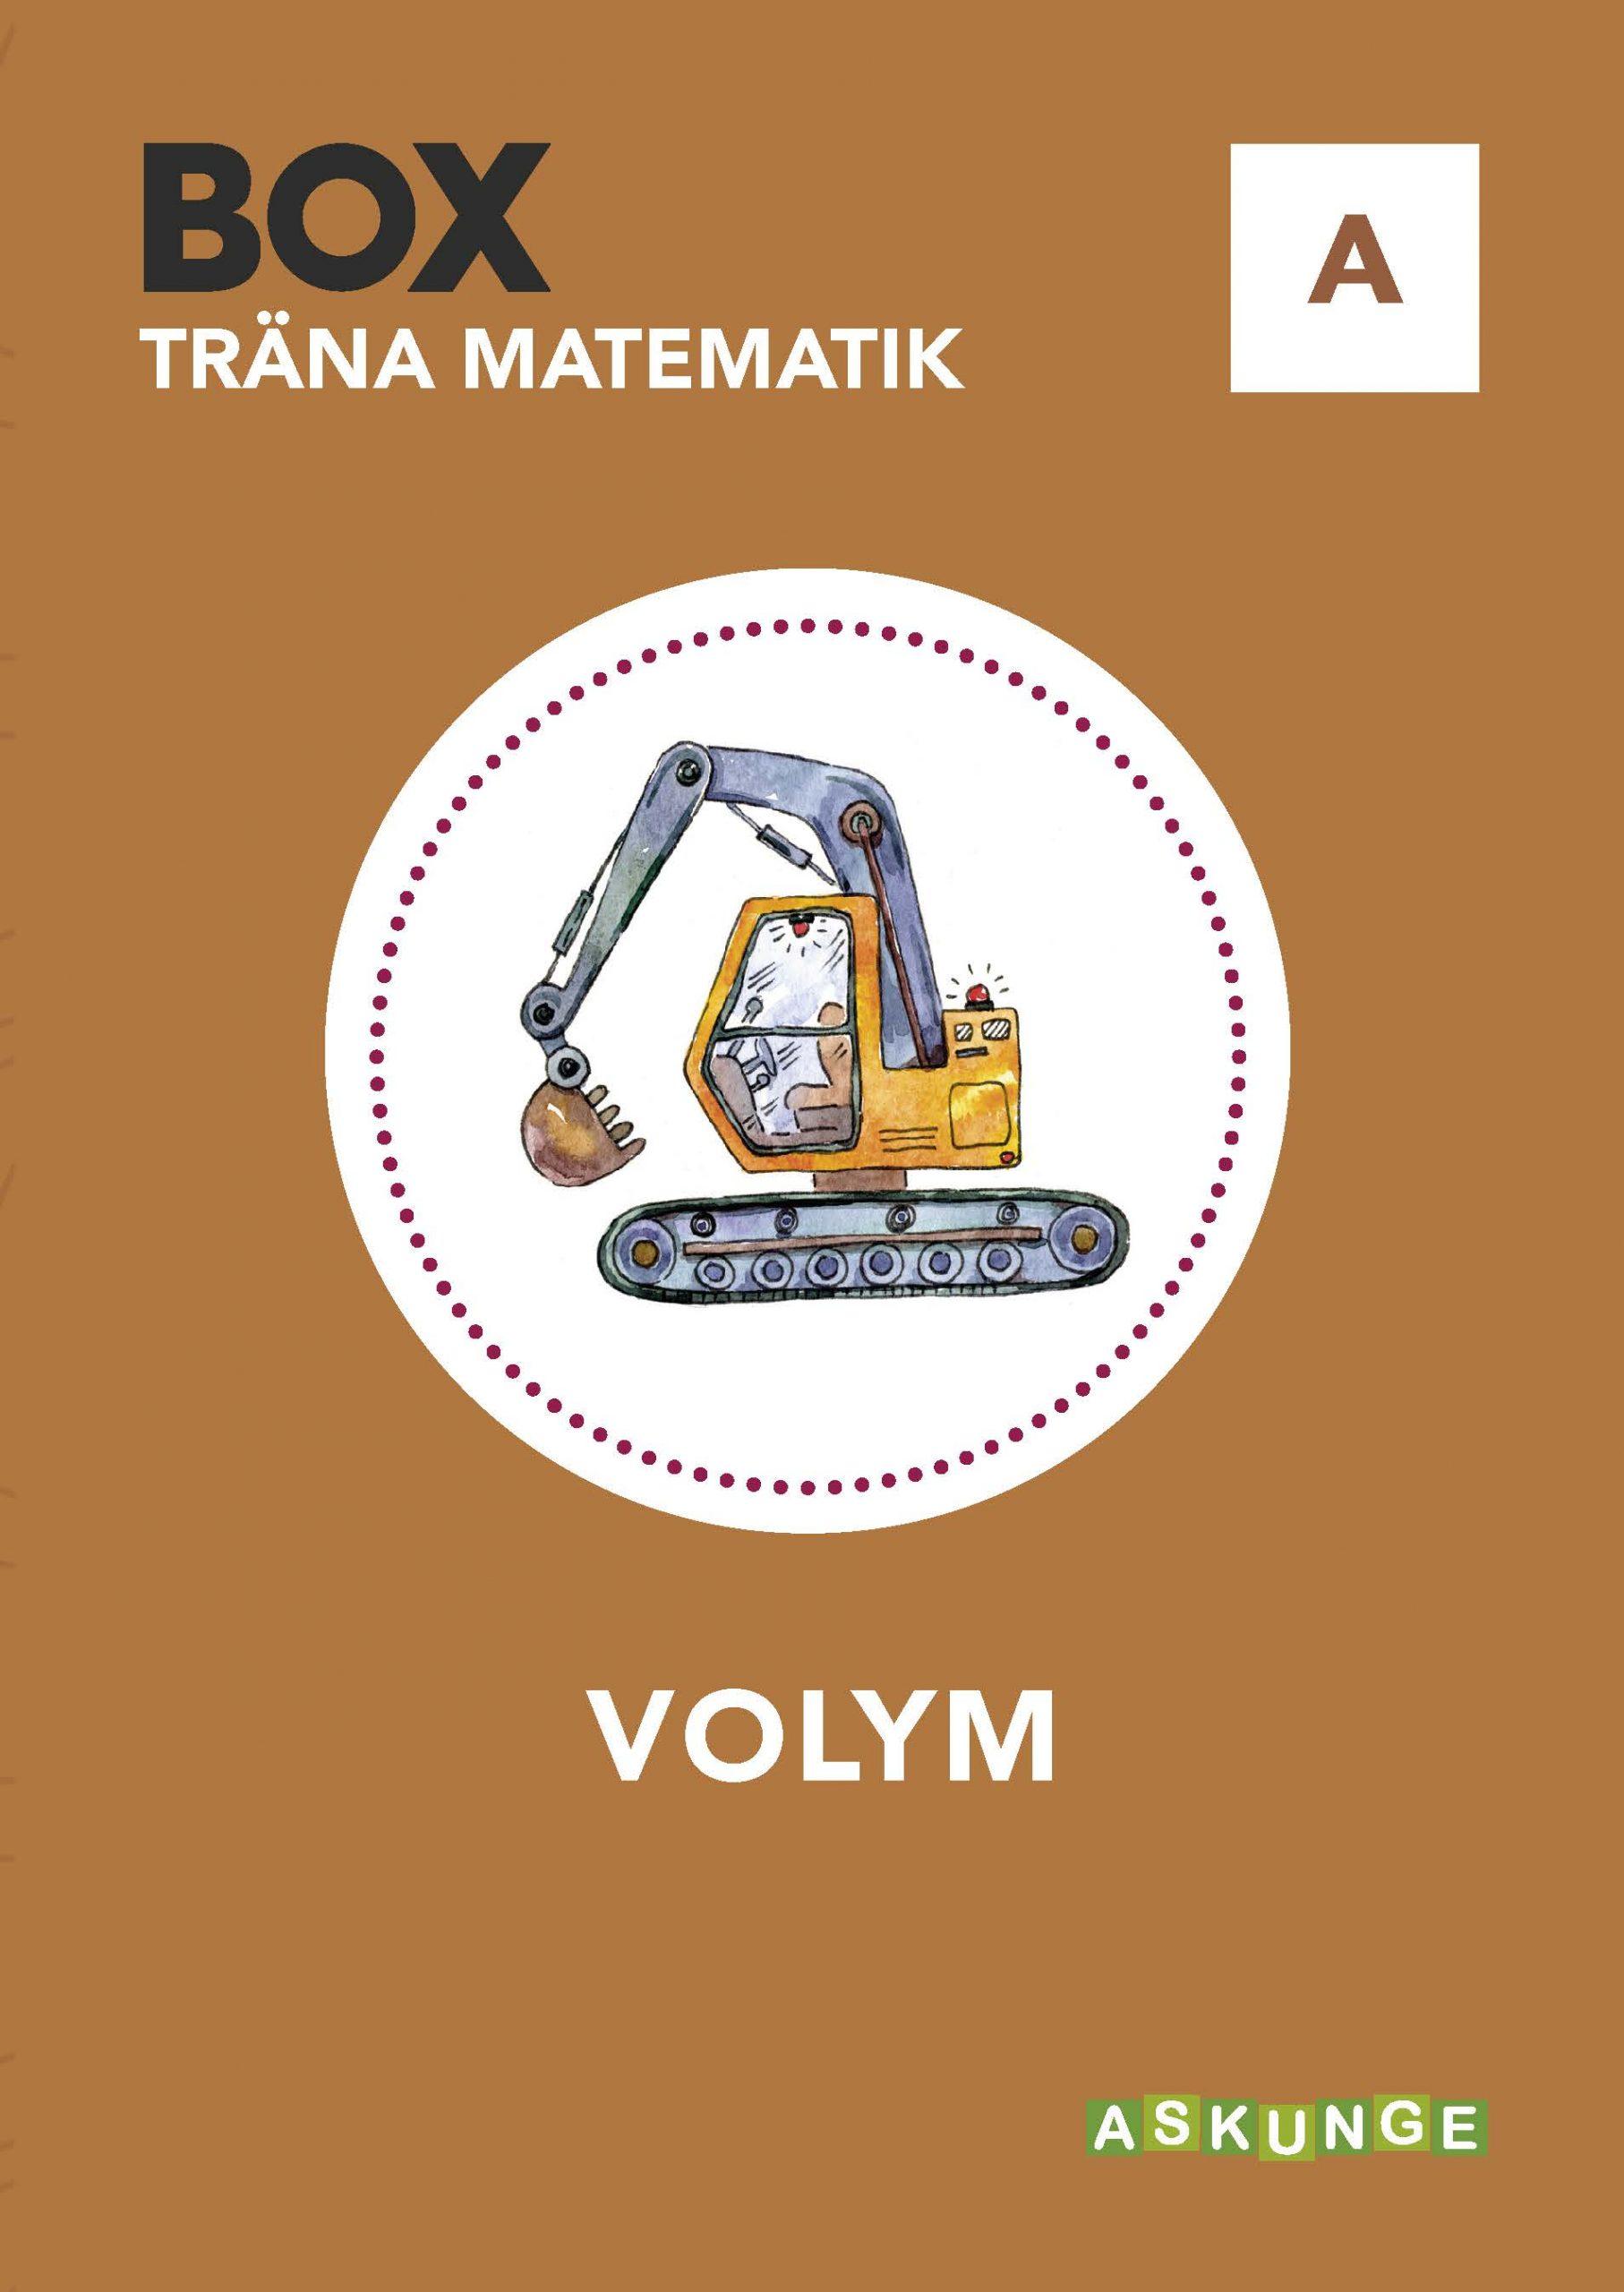 BOX-Volym LR